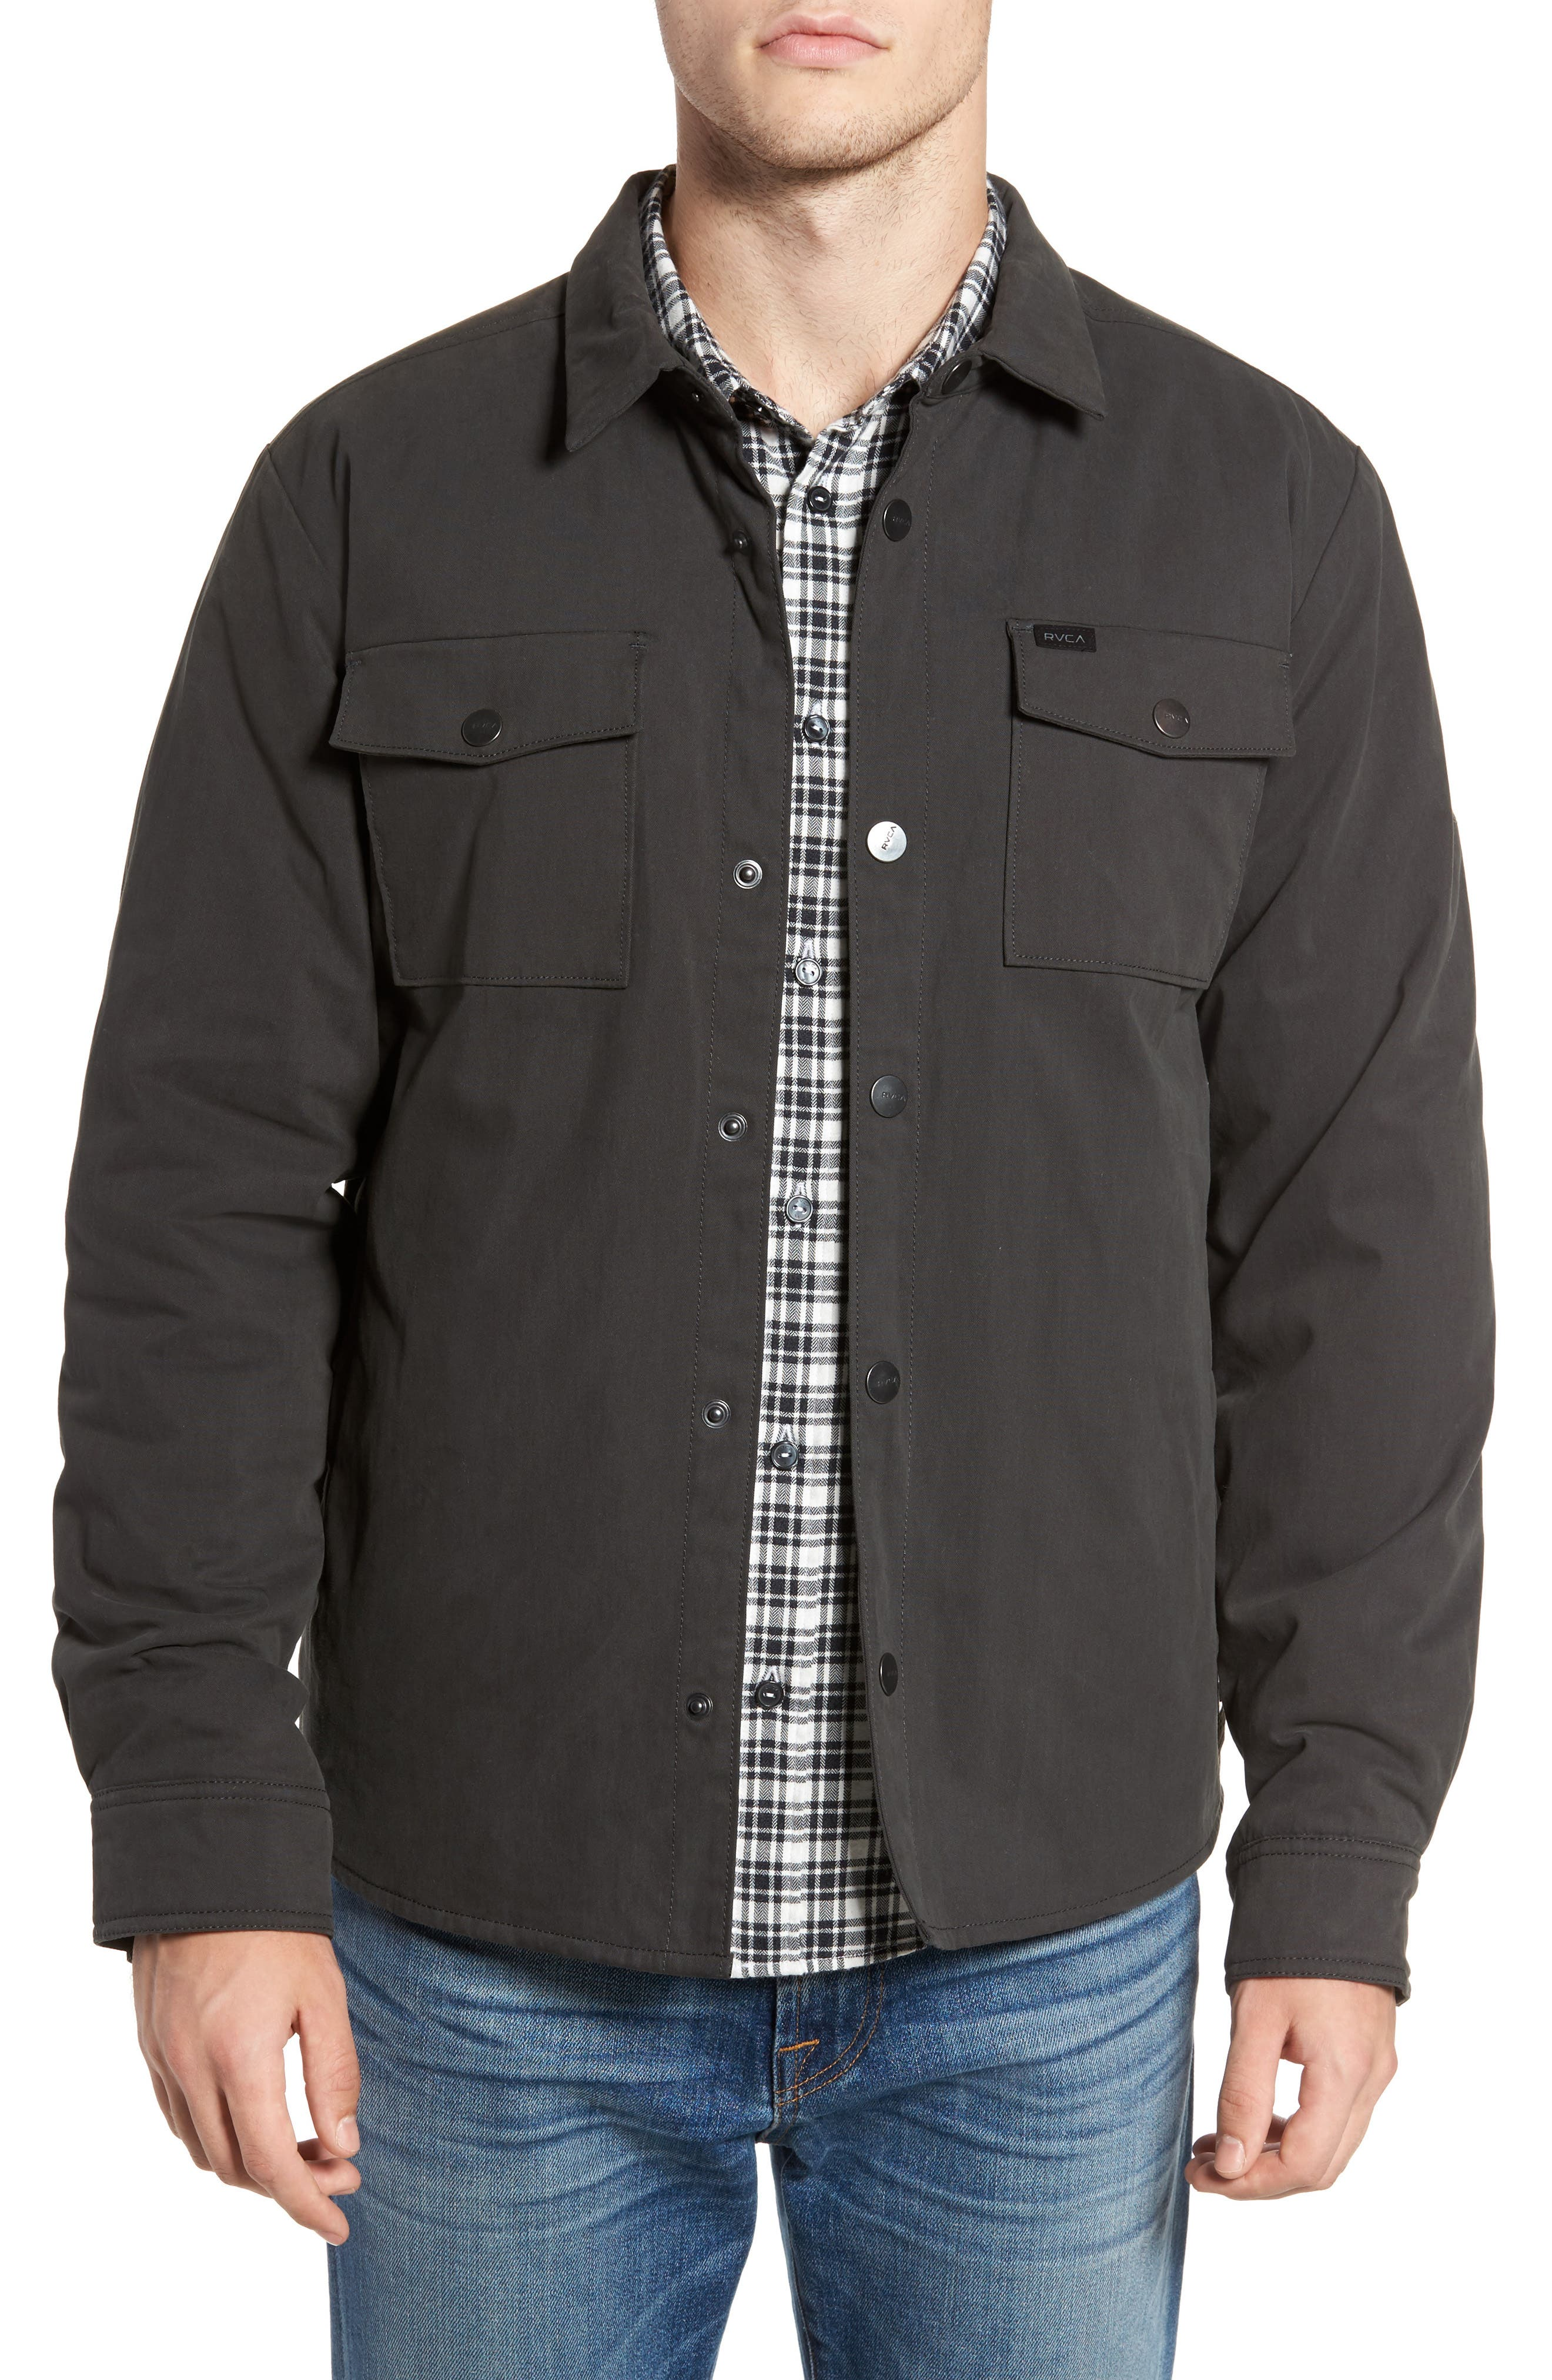 Officer's Shirt Jacket,                         Main,                         color, Pirate Black